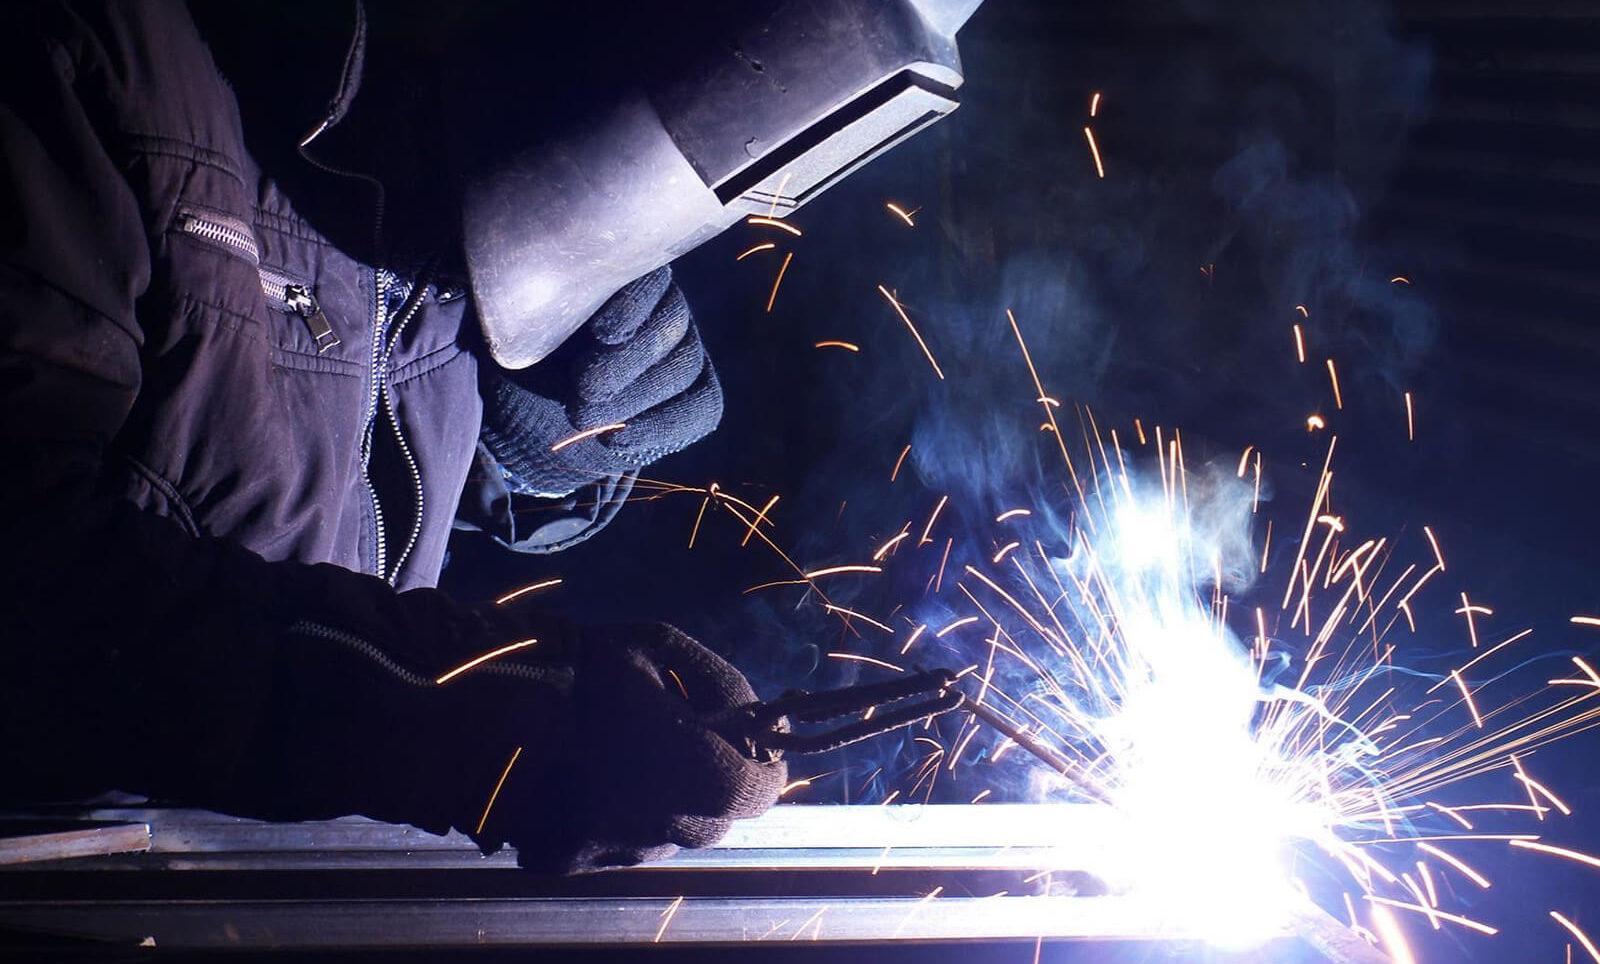 Masked man welding